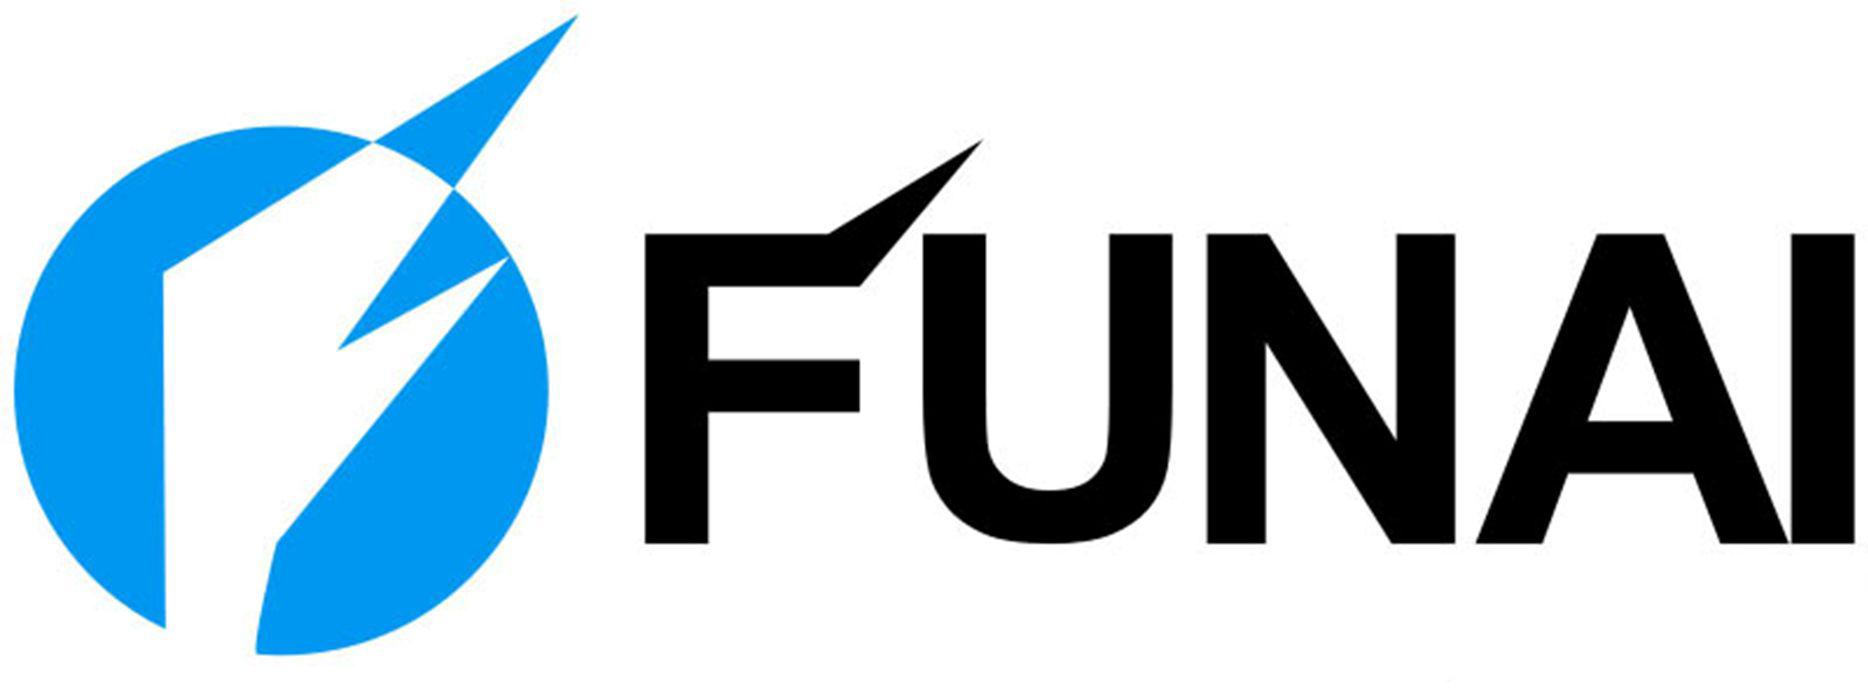 Funai logo wallpapers HD